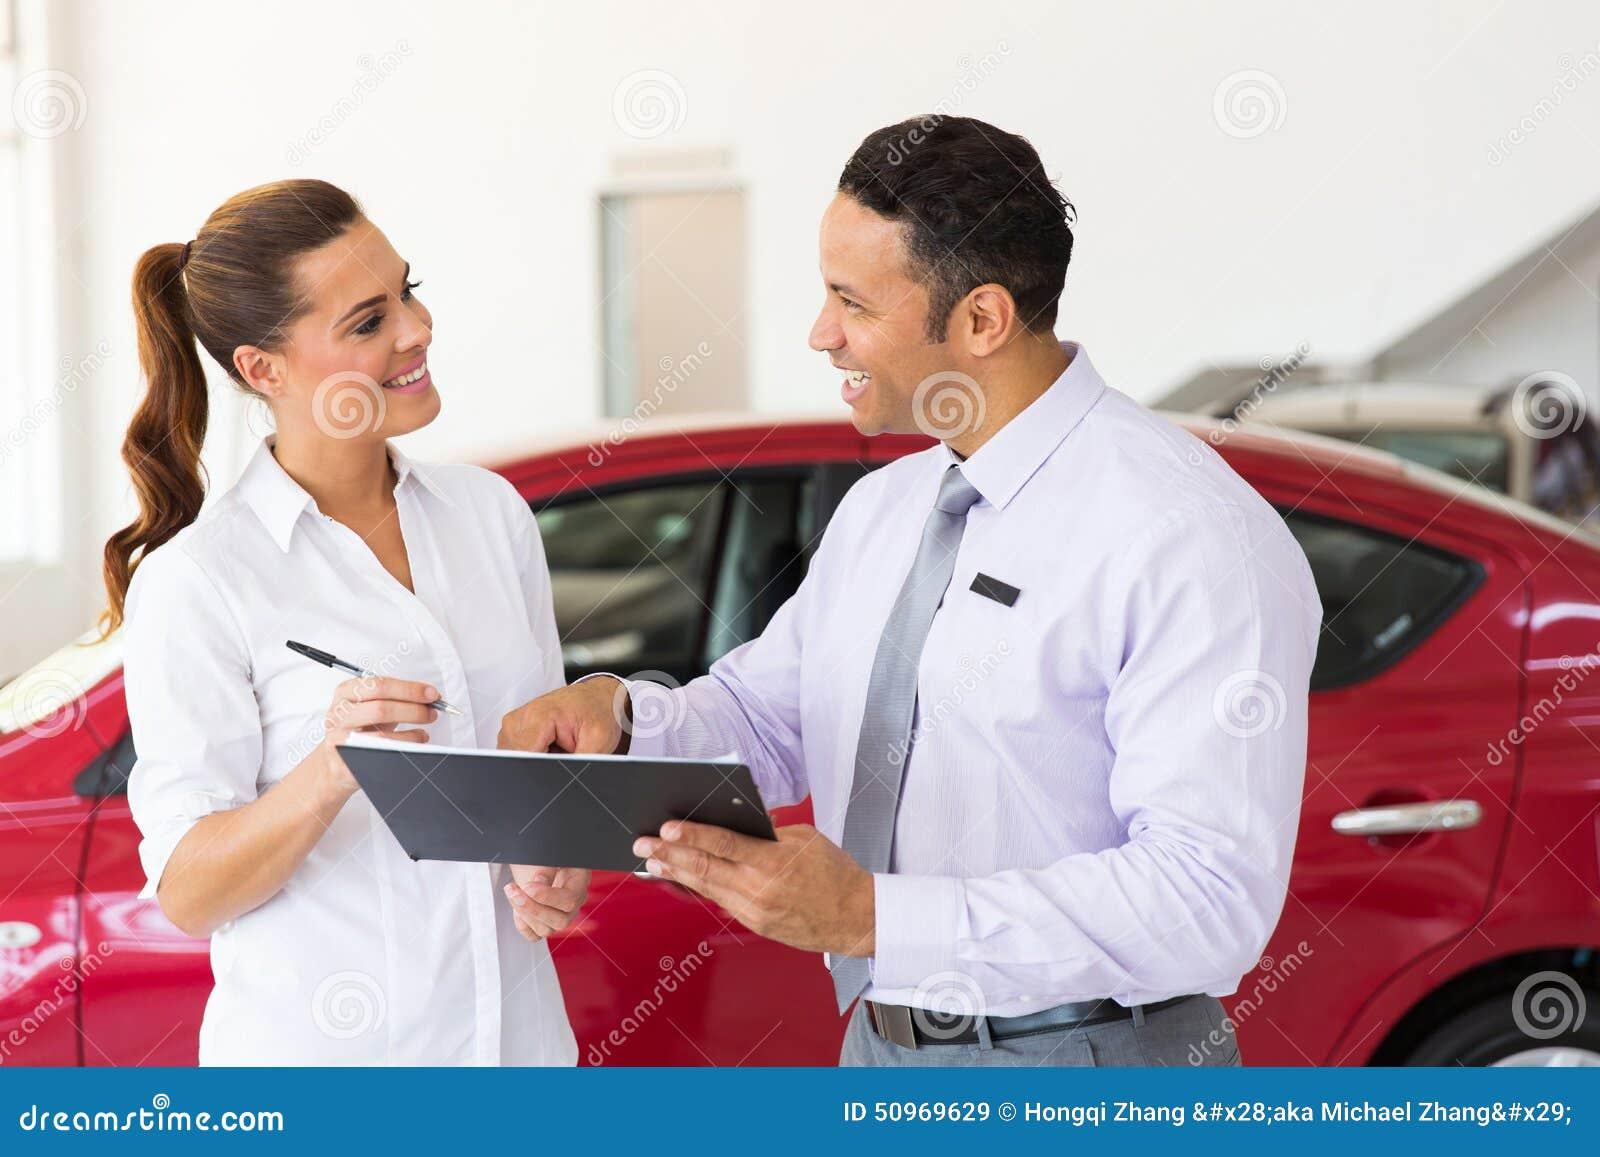 Car salesman customer